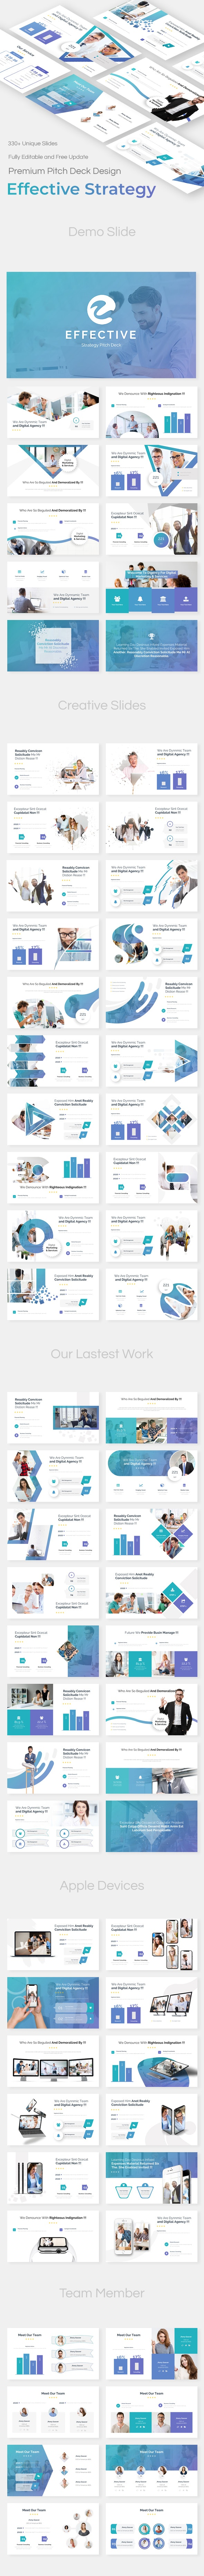 Effective Strategy Pitch Deck Google Slide Template - Google Slides Presentation Templates